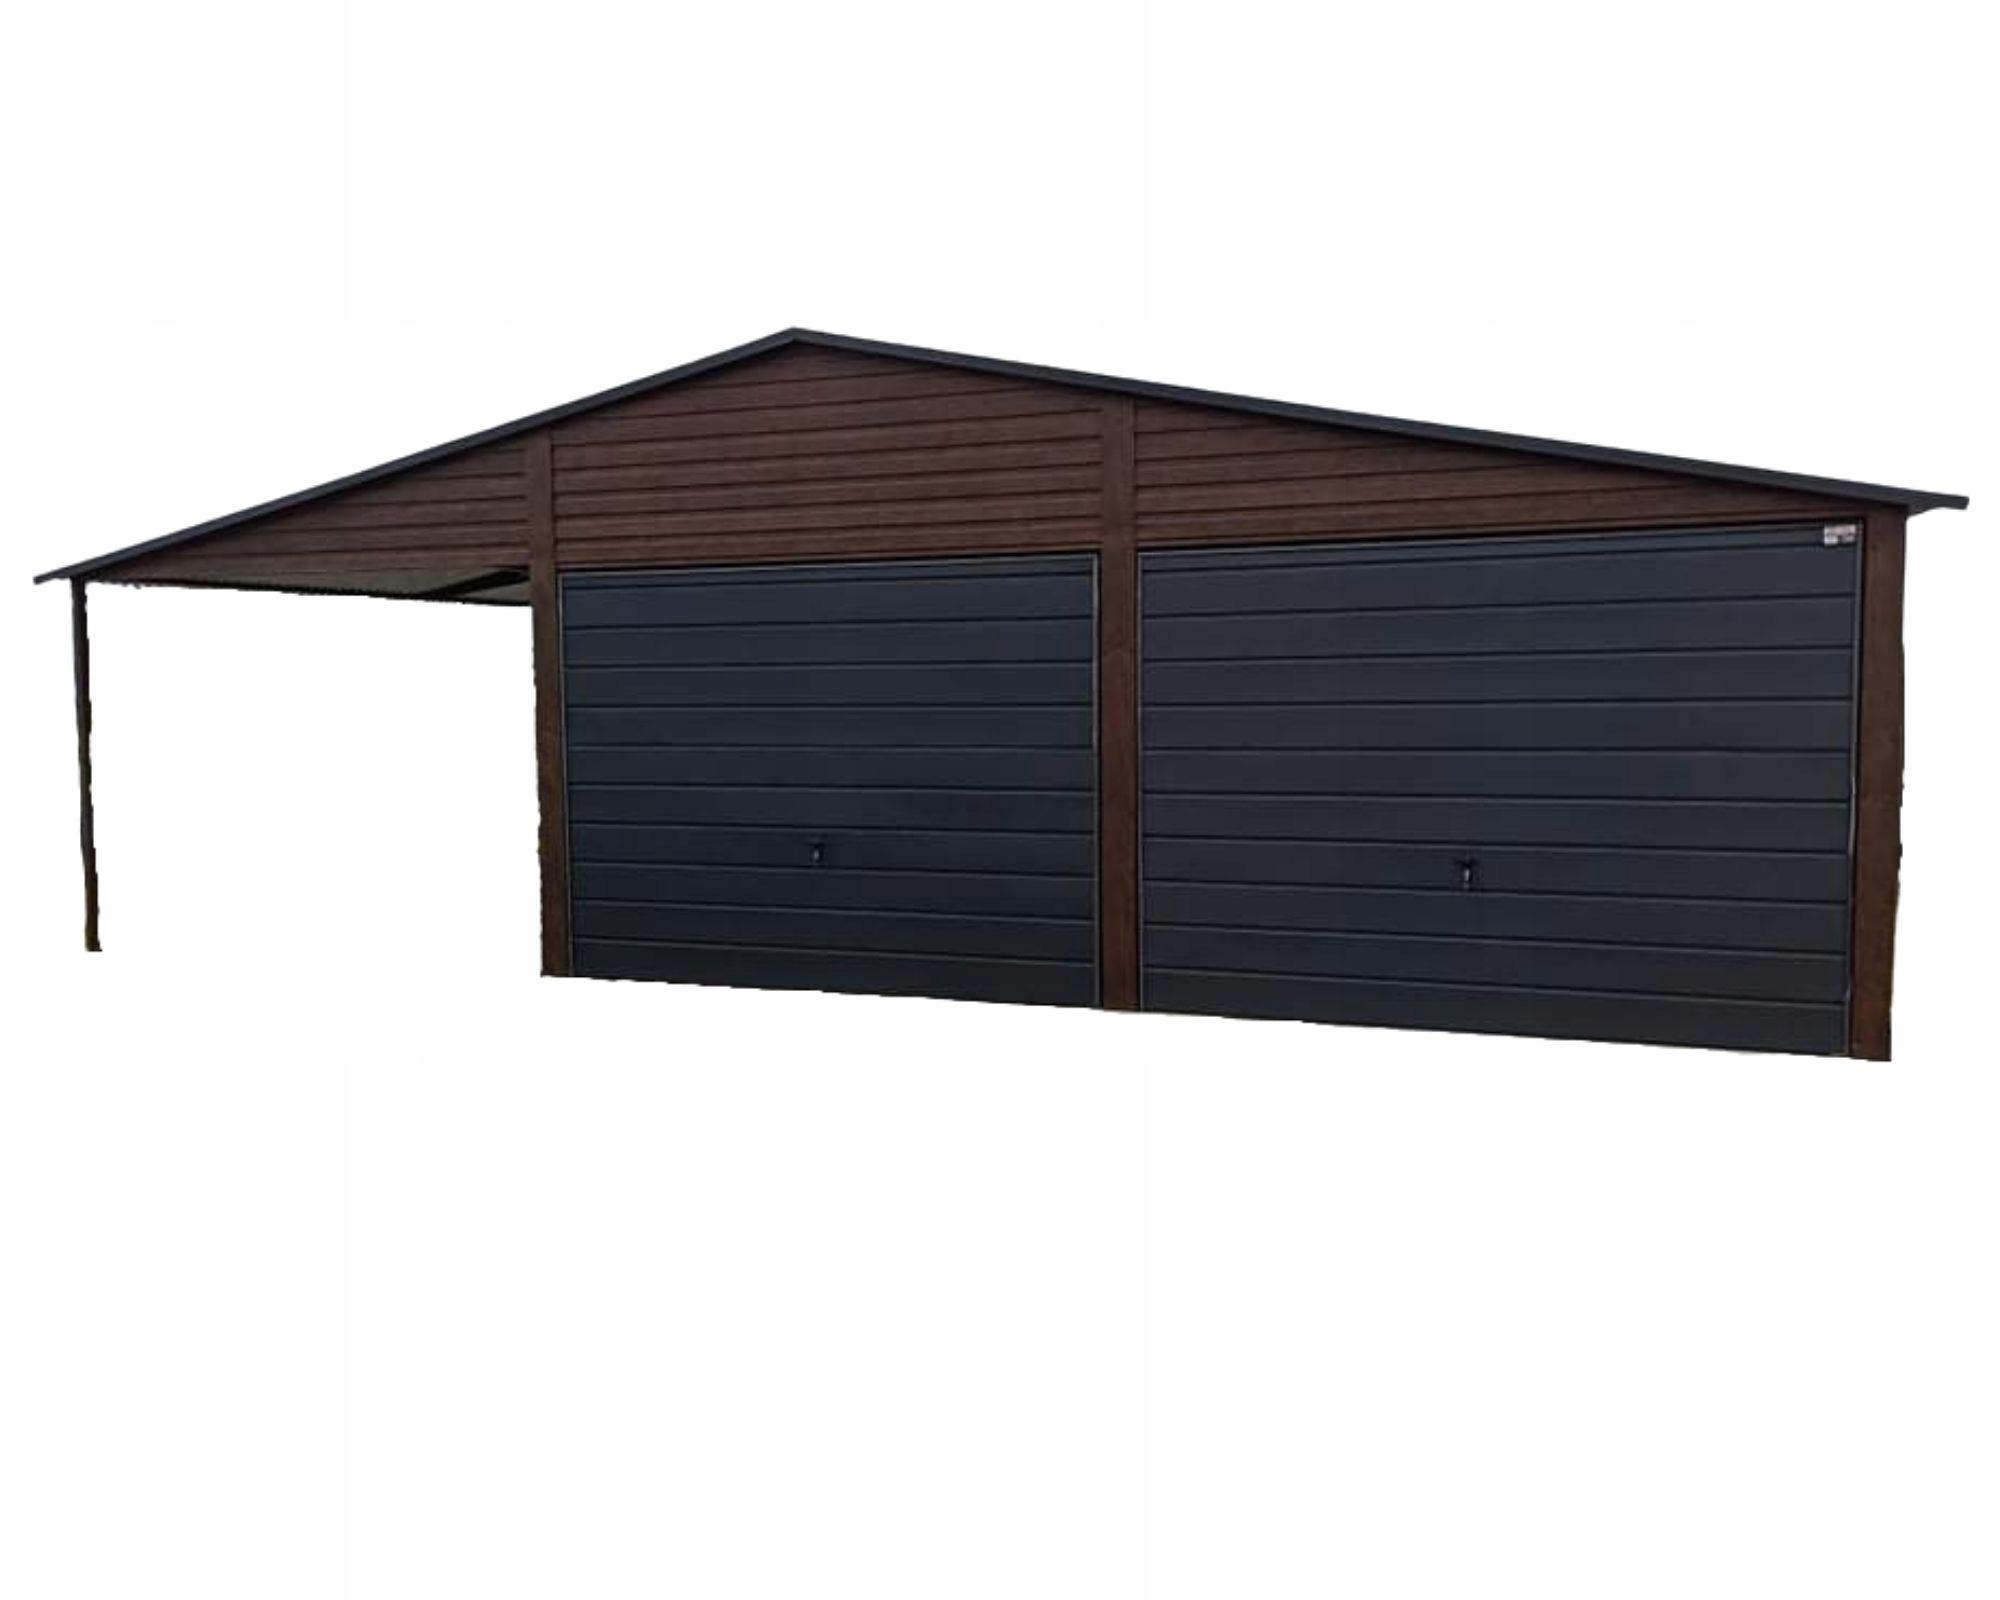 Жестяные гаражи 6х5 + 3 под дерево